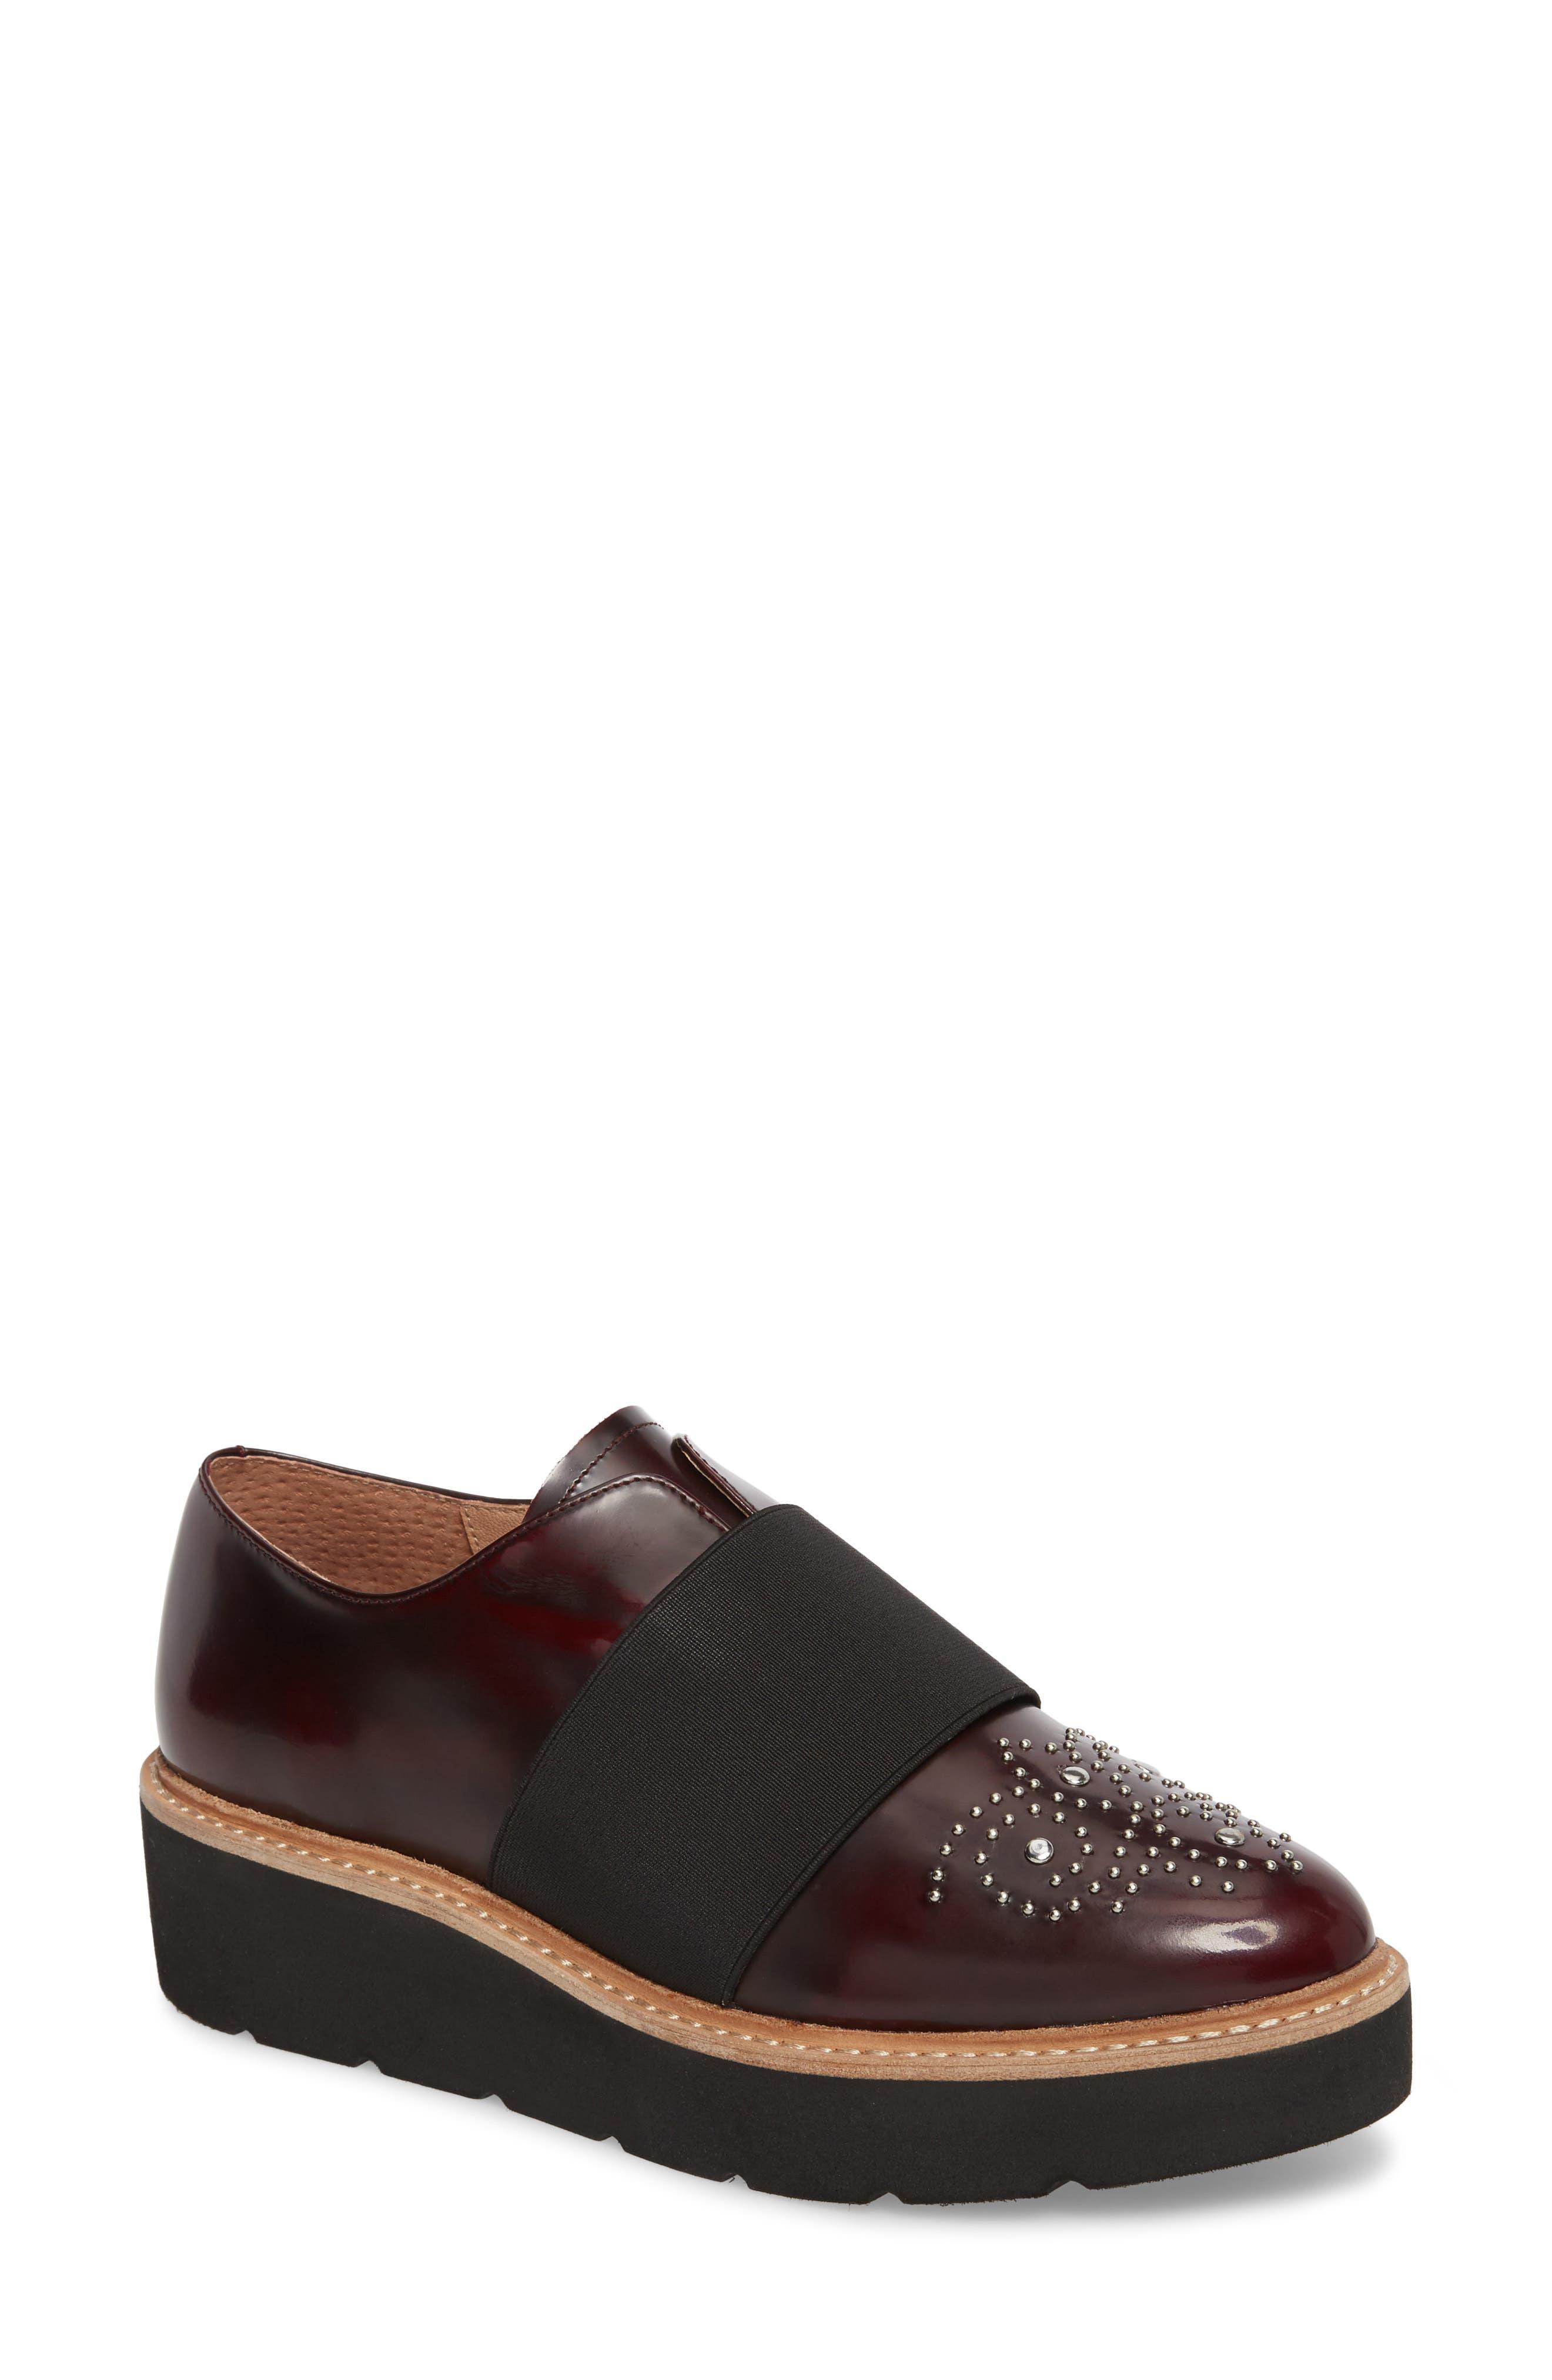 Jenna Platform Loafer,                             Main thumbnail 1, color,                             Burgundy Leather